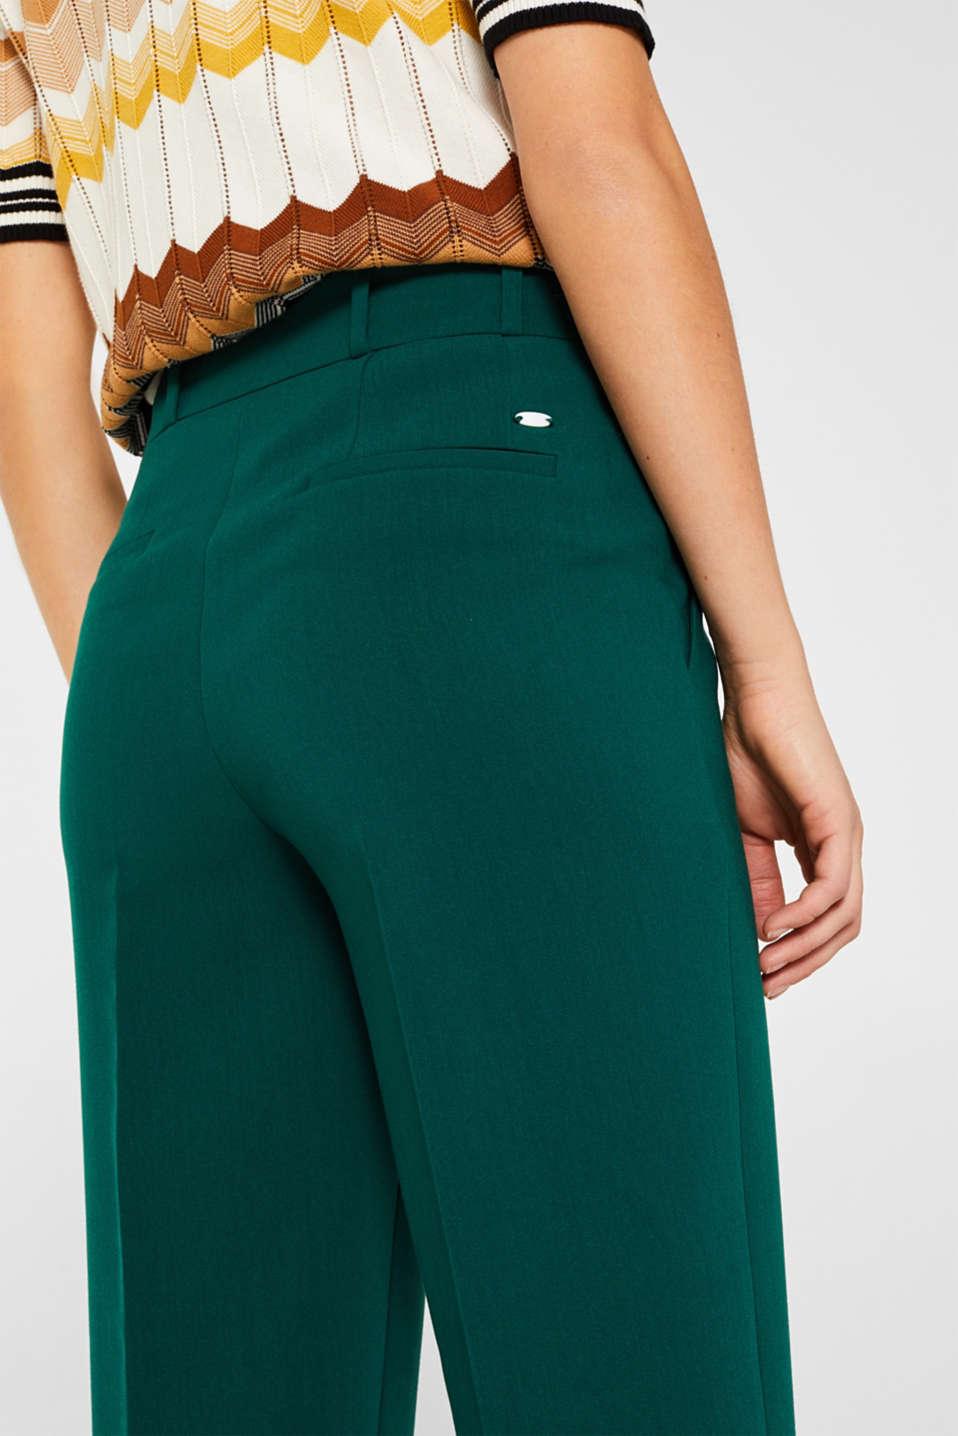 Pants woven, DARK TEAL GREEN, detail image number 2